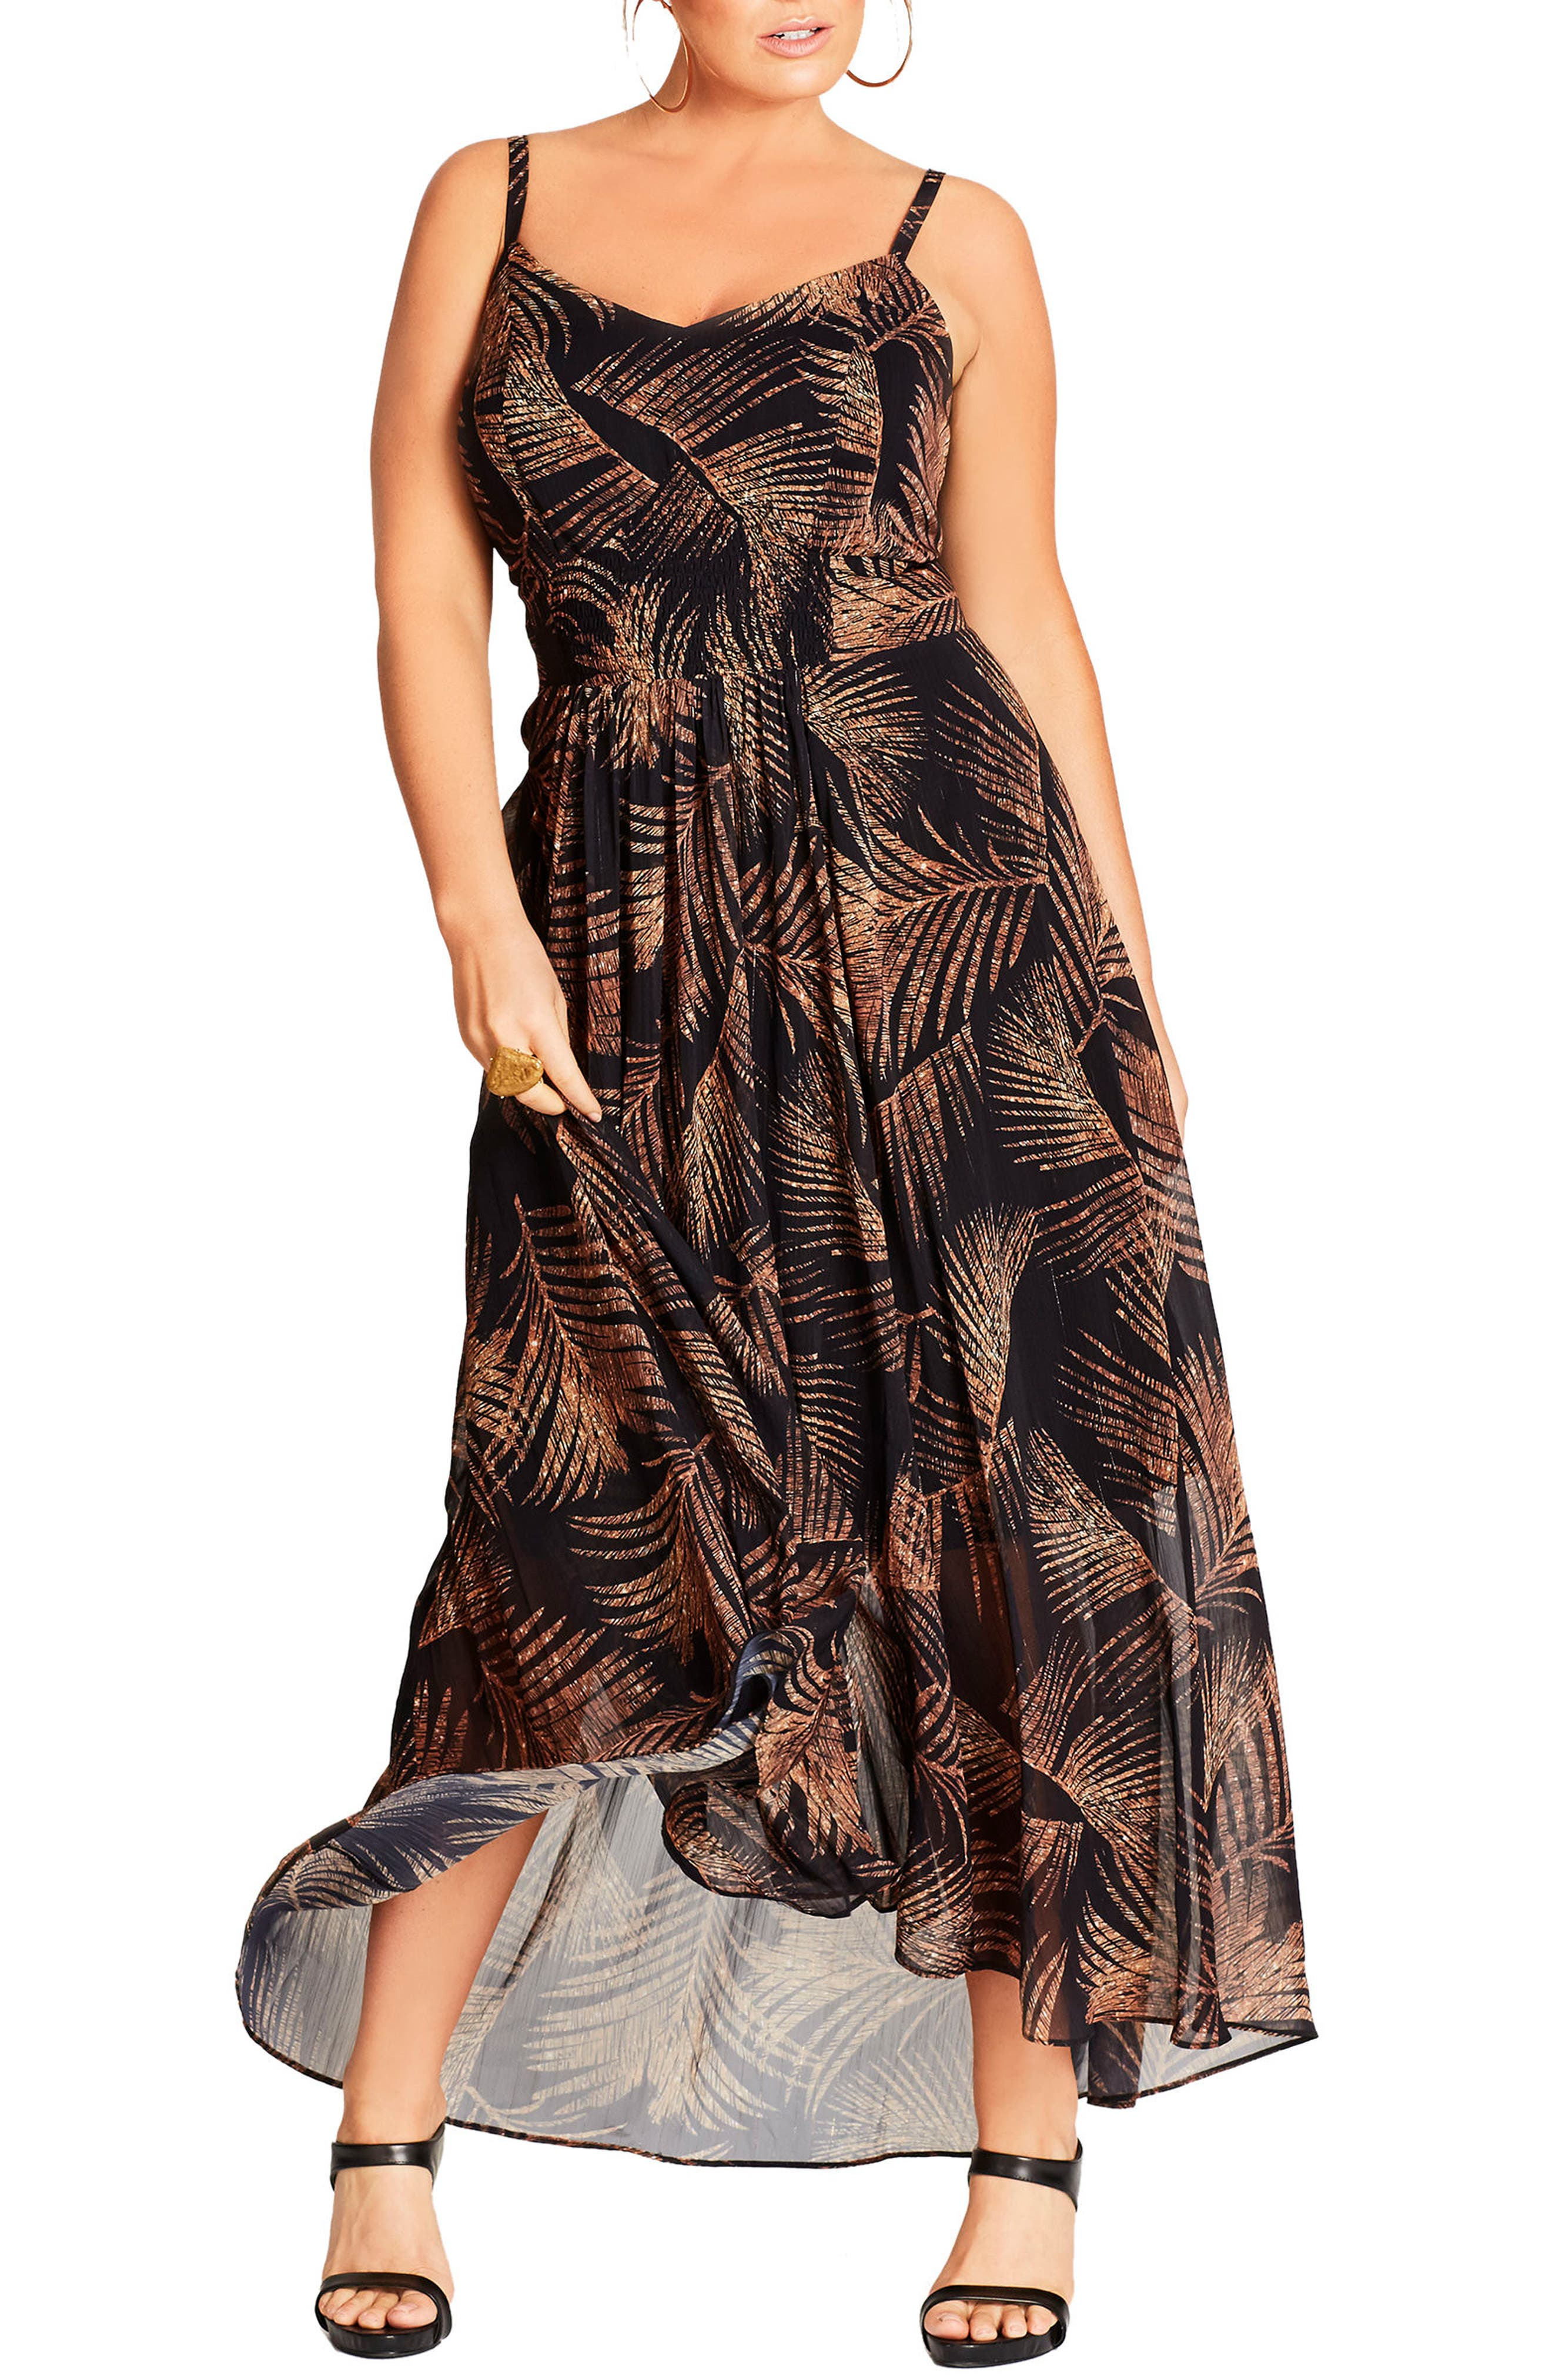 Main Image - City Chic Party Time Print Chiffon Maxi Dress (Plus Size)